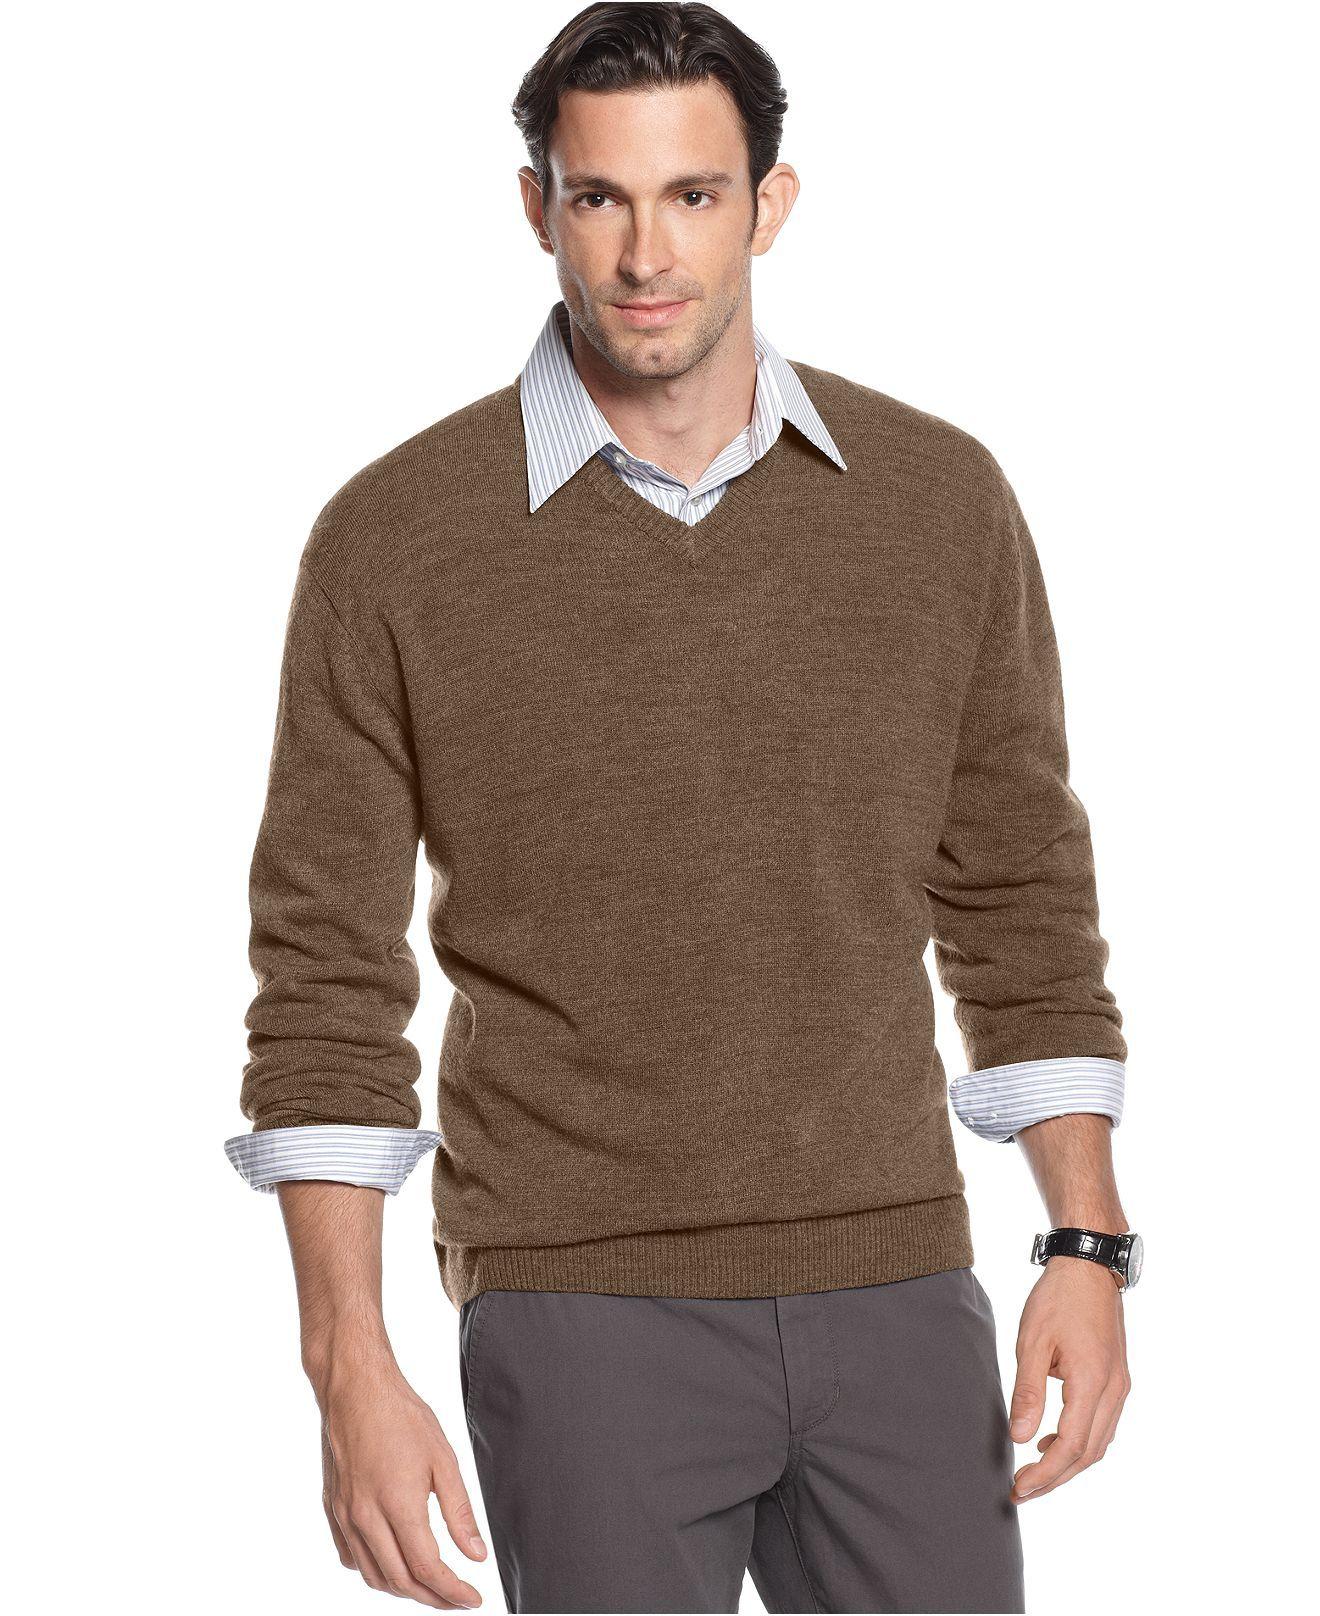 Oscar De La Renta Sweater Solid V Neck Sweater Mens Sweaters